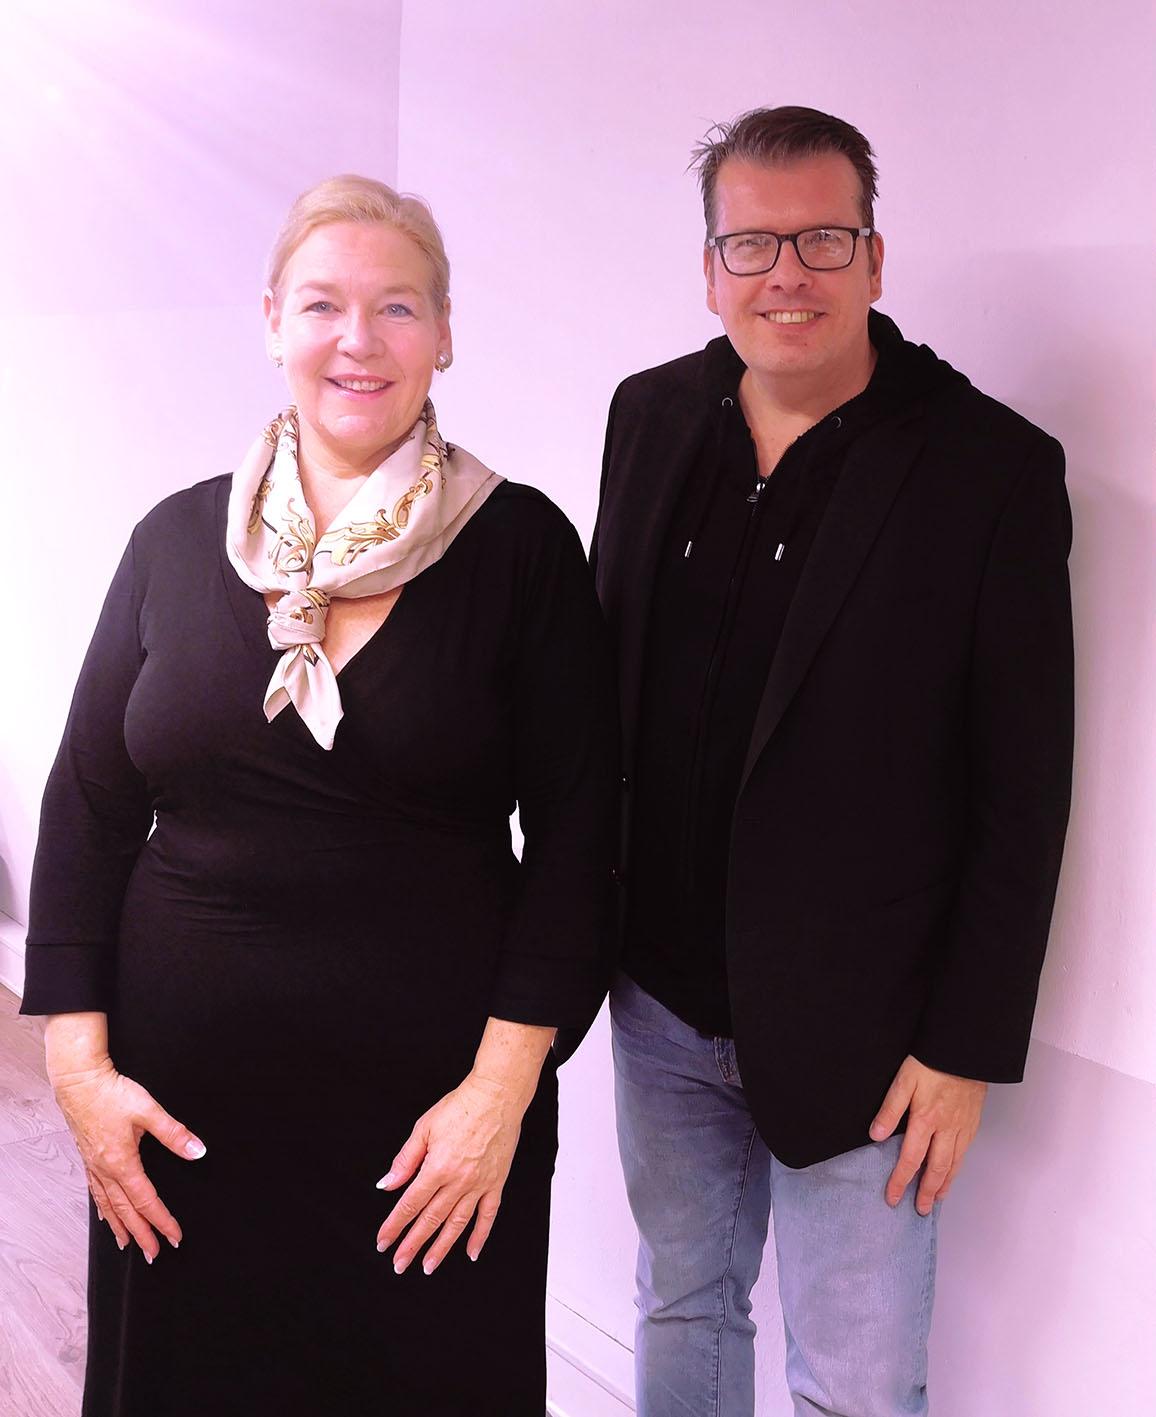 Professionelles Team. Ulrike Krämer (IND) und Michael B. Rehders.